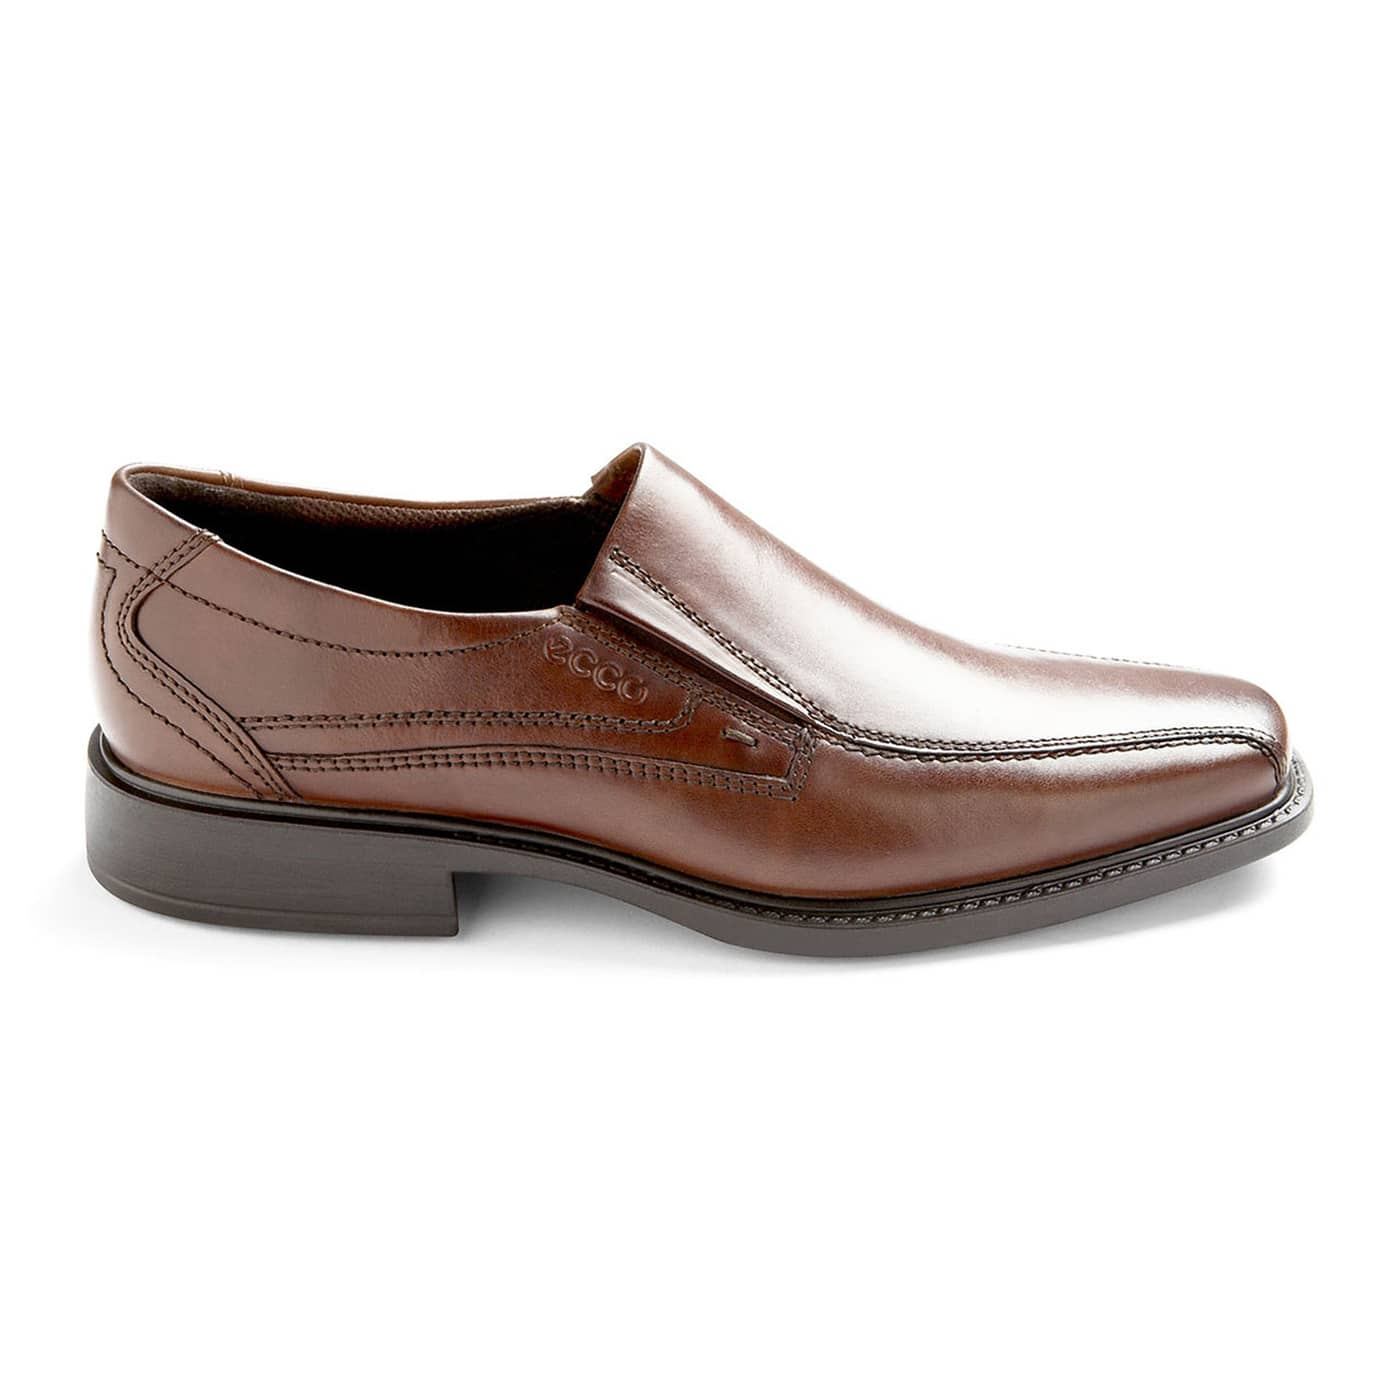 Ecco Shoes: Women's Freja Sandal II or Men's Ecco New Jersey Slip-On $70 & More + Free Shipping